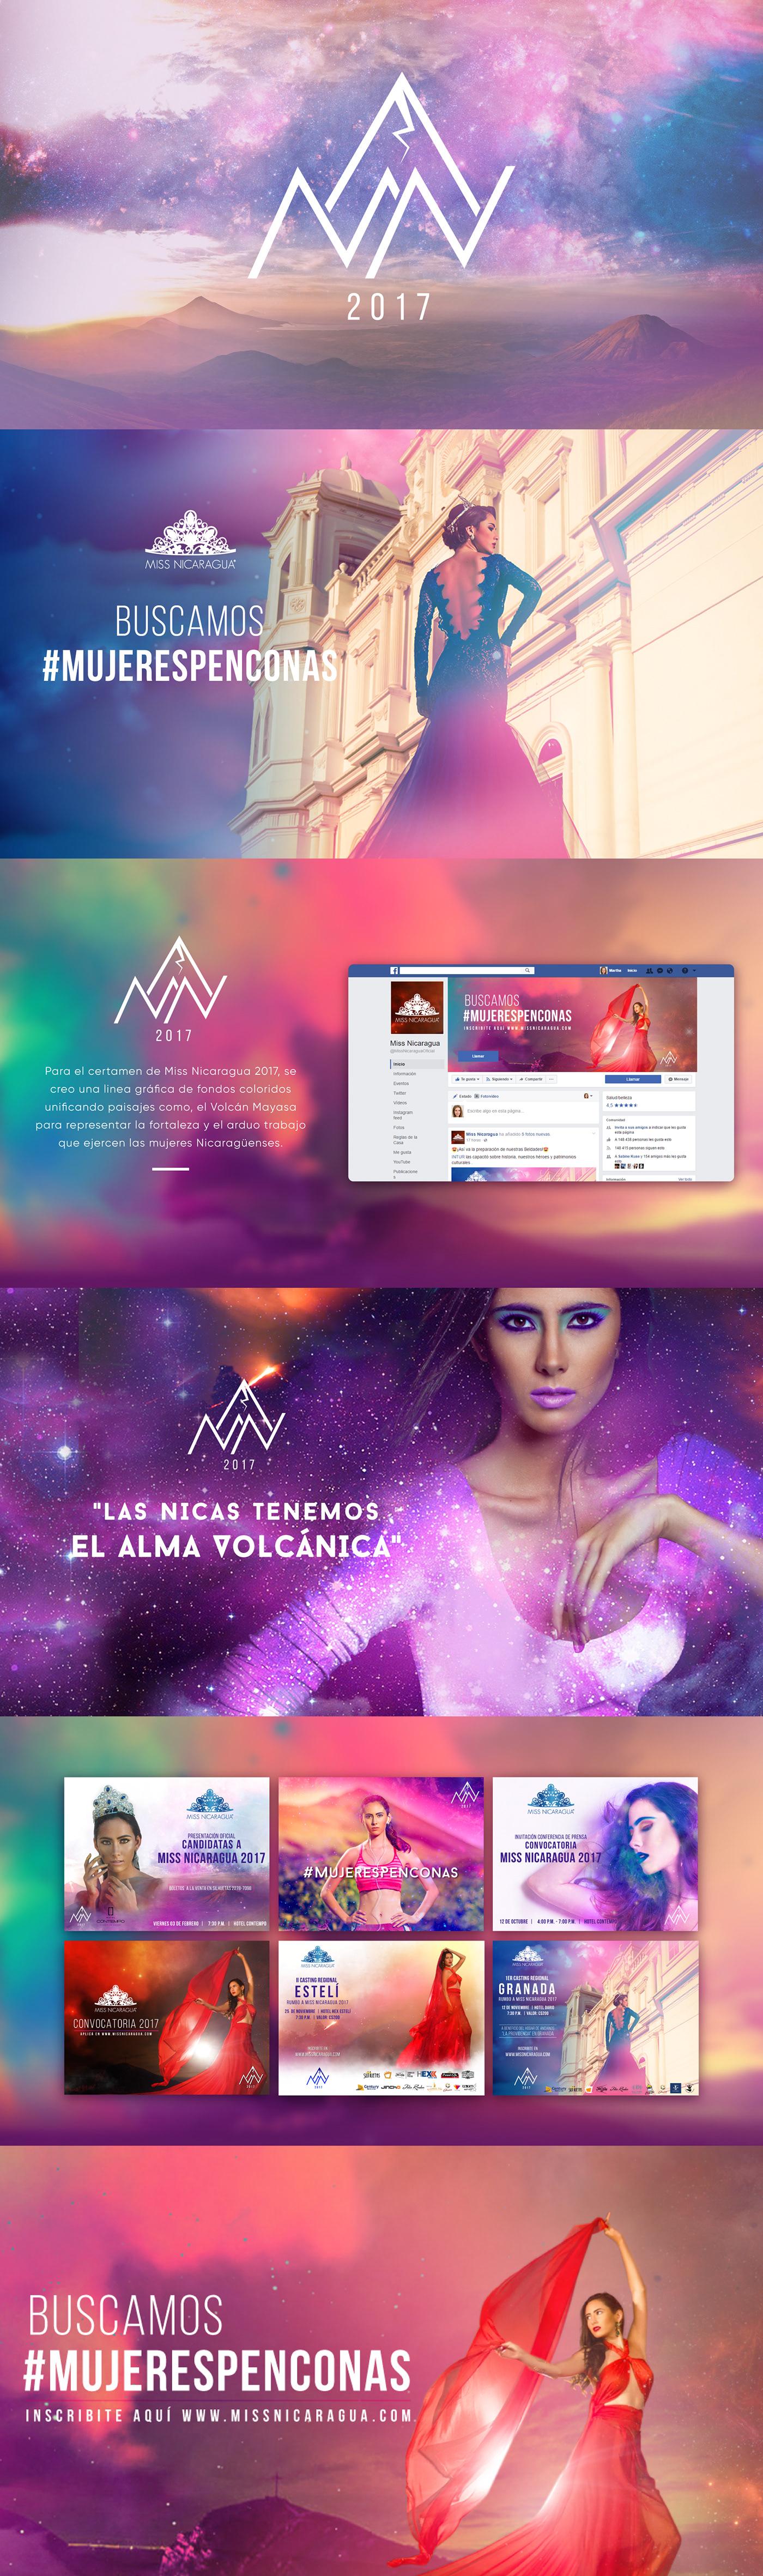 Branding Digital agency agencia de publicidad Nicaragua Bold Creativity miss universe miss Film   motion graphics